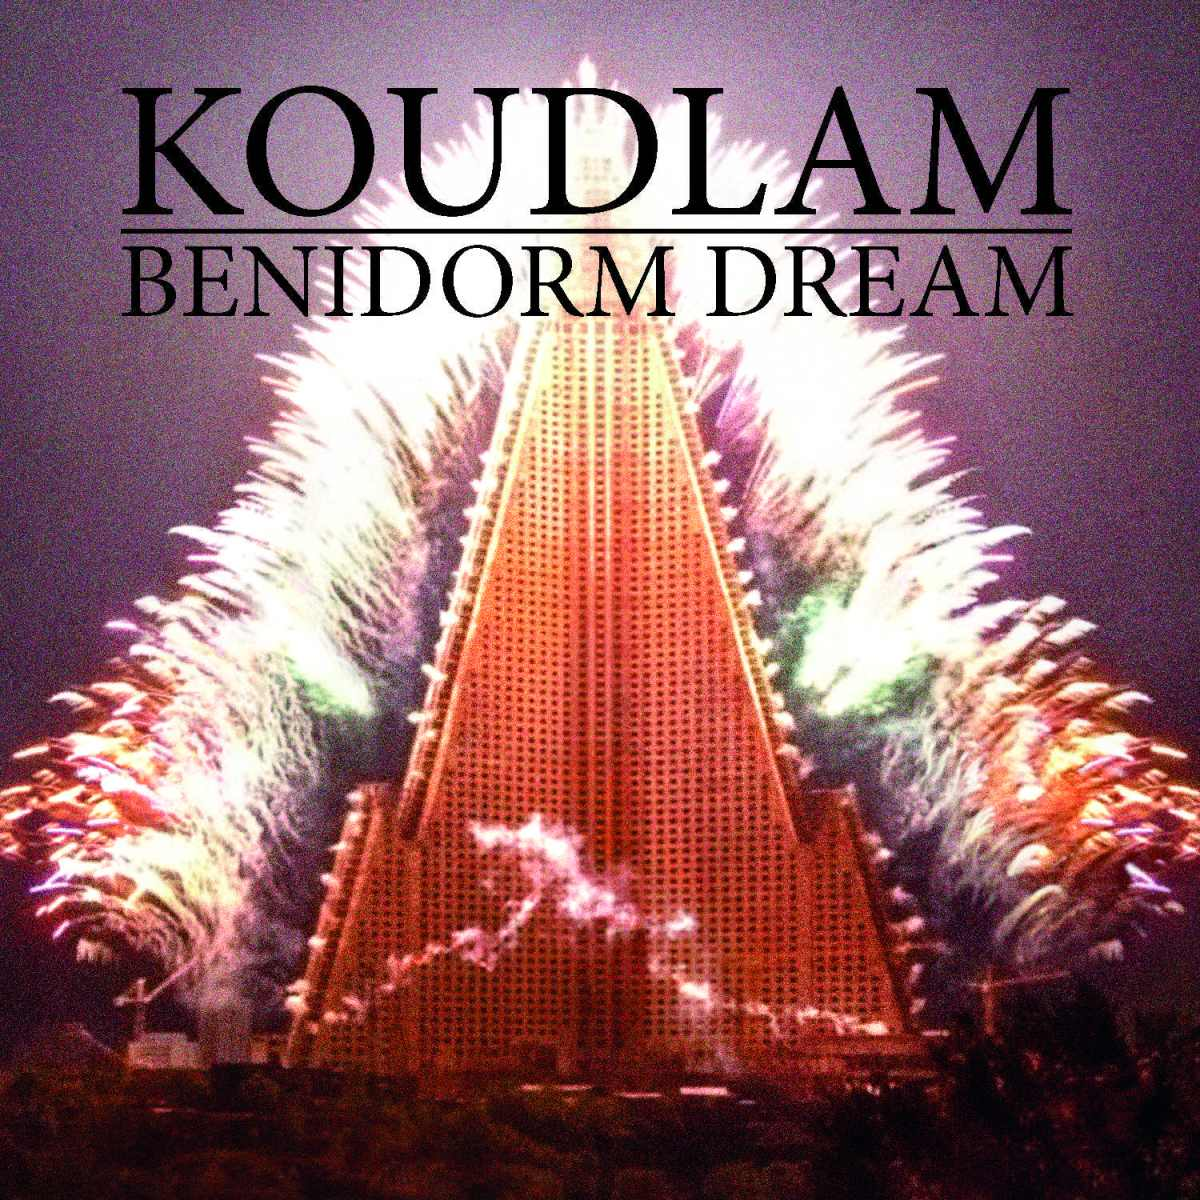 Koudlam - Benidorm Dream (2014) - (Invité)